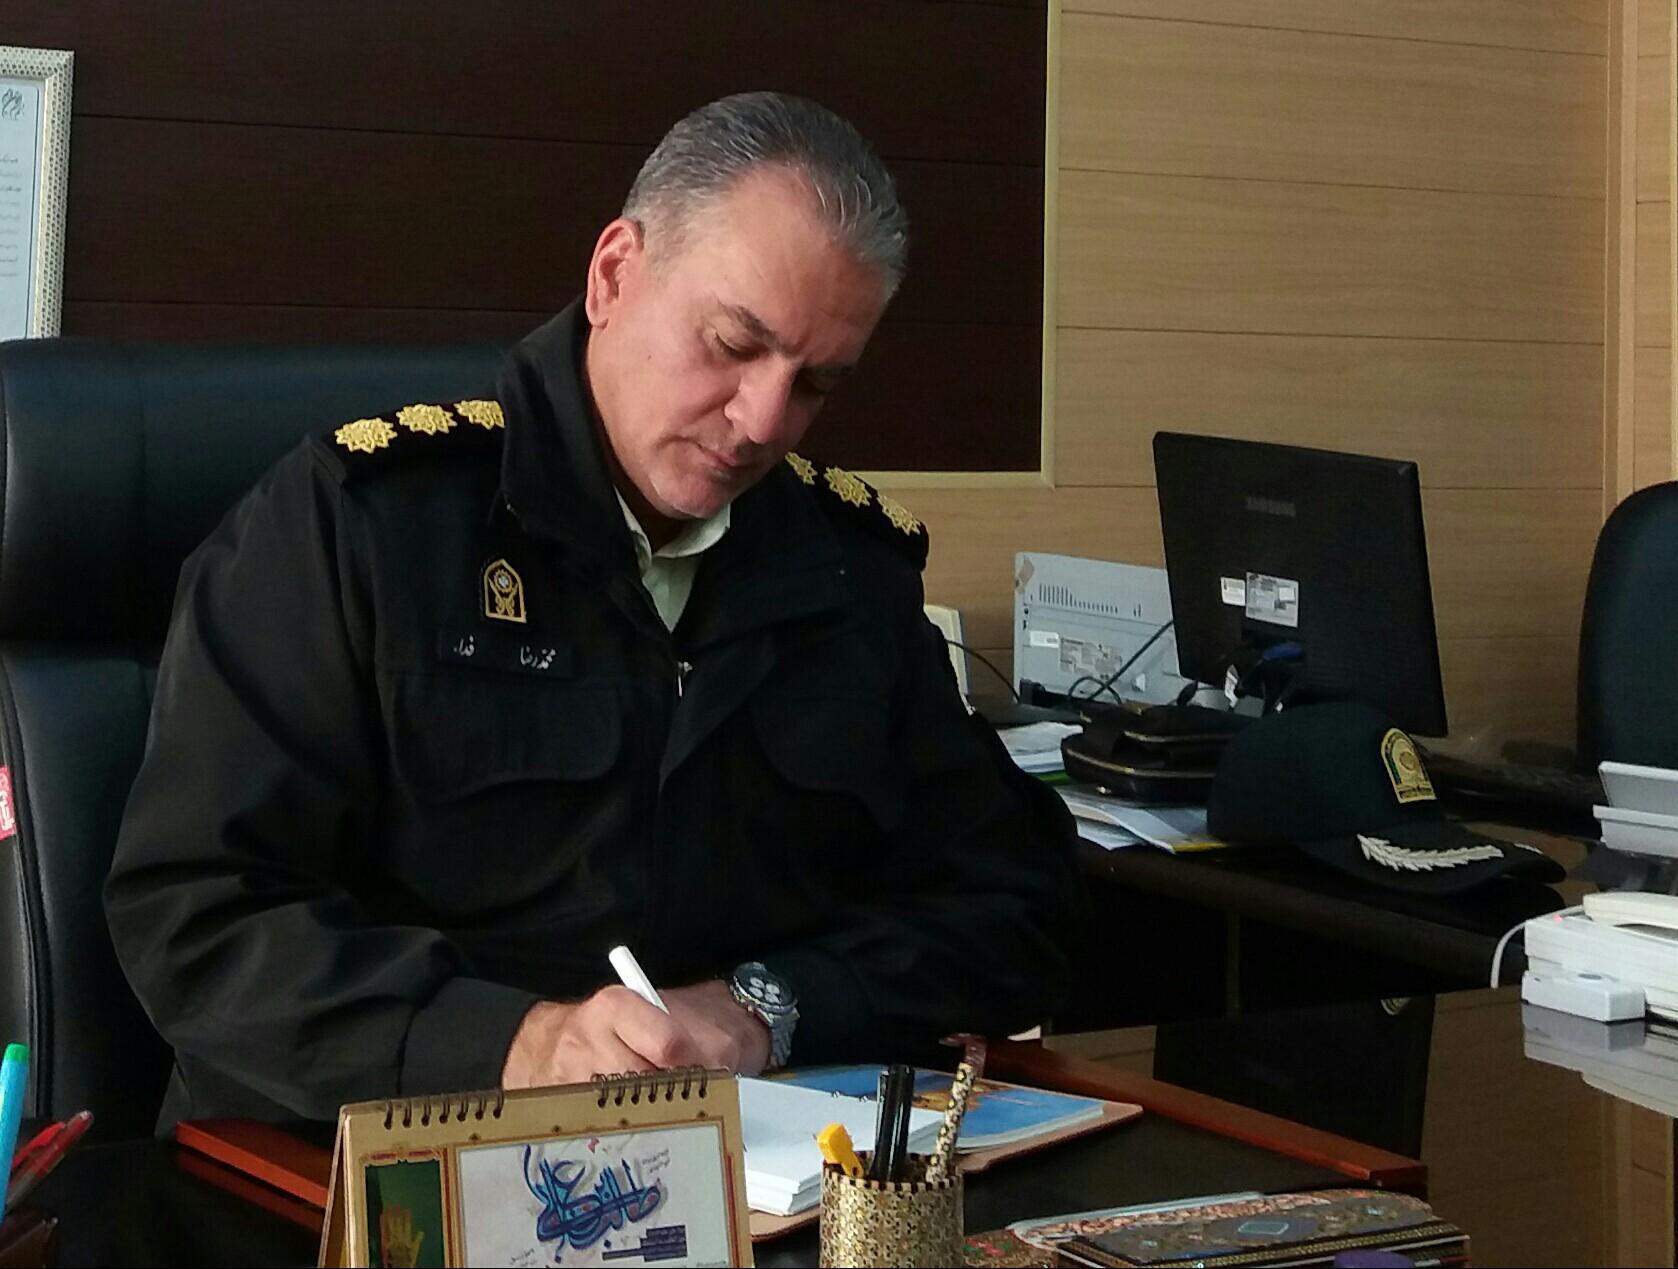 کشف ۱۱۰ کیلوگرم تریاک در عملیات پلیس کرمان